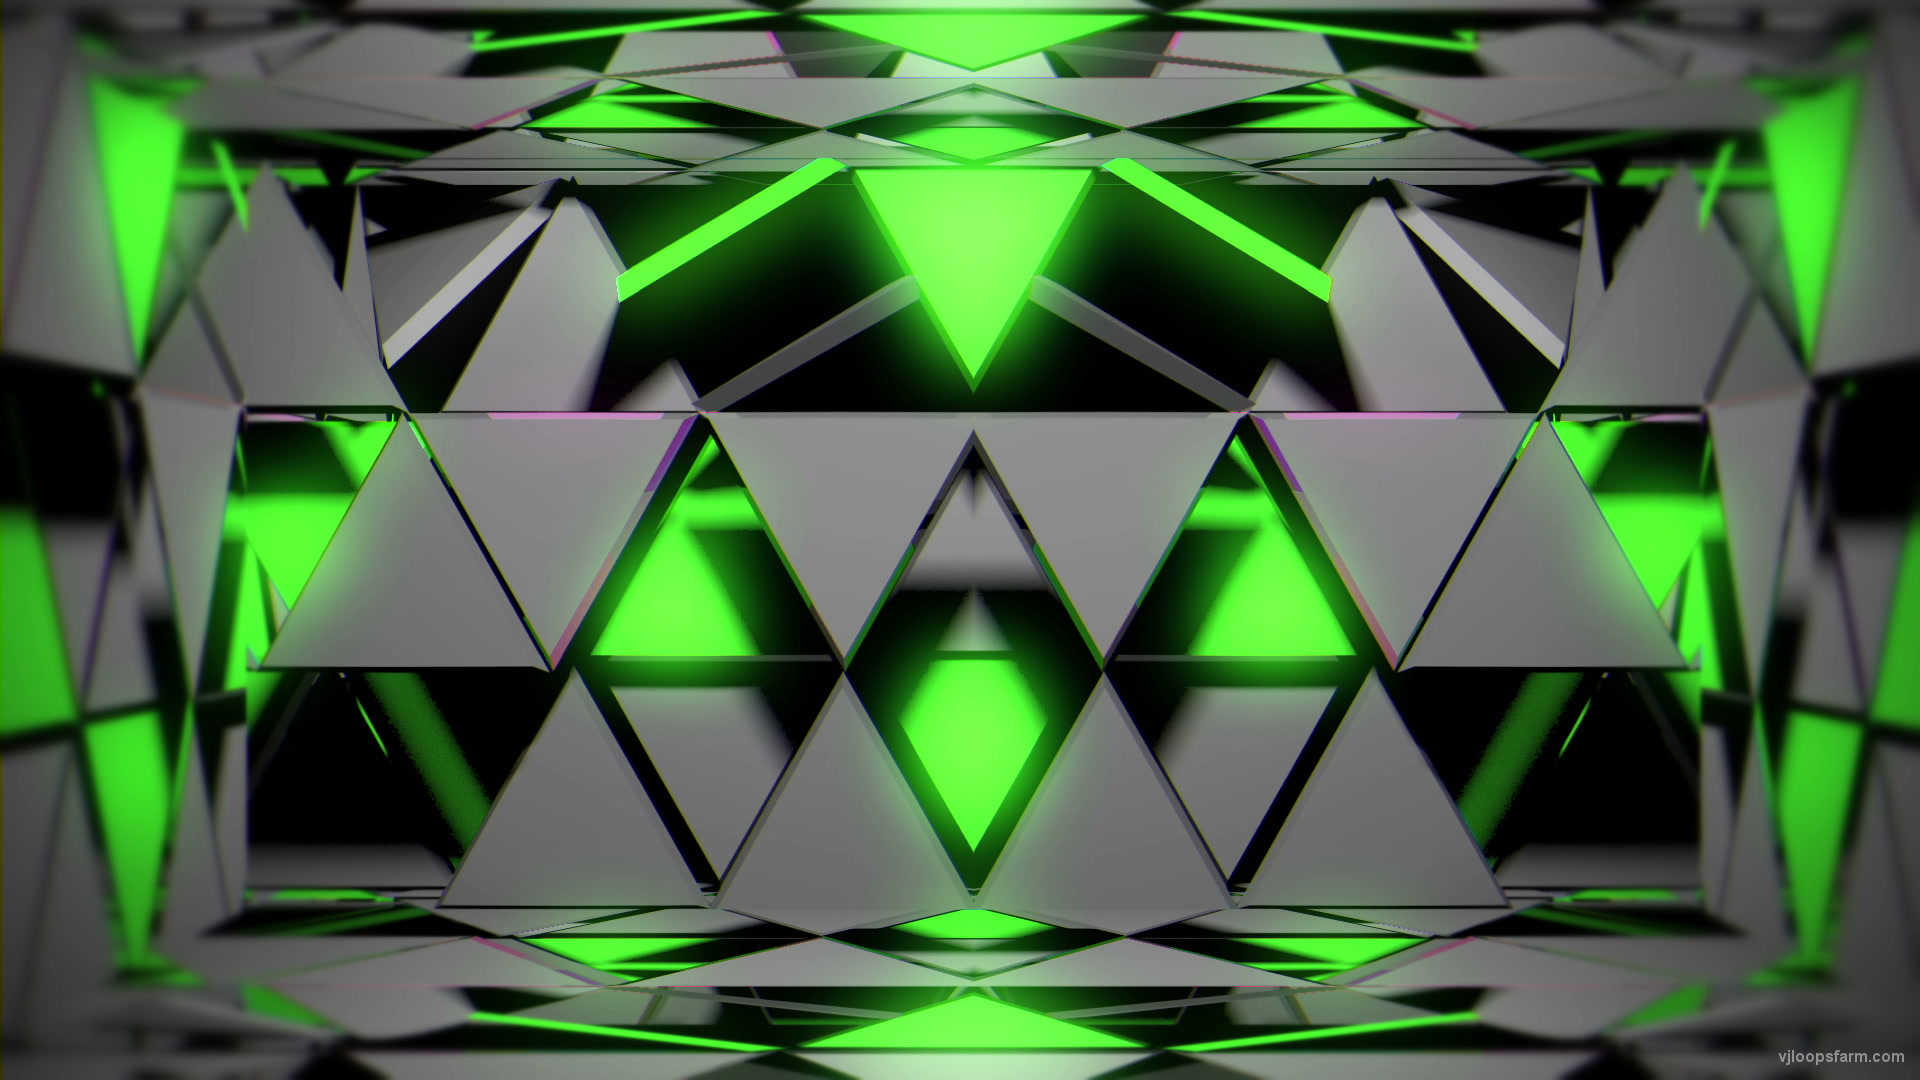 vj video background Glowing-Room-LIMEART-D1-Neon_003